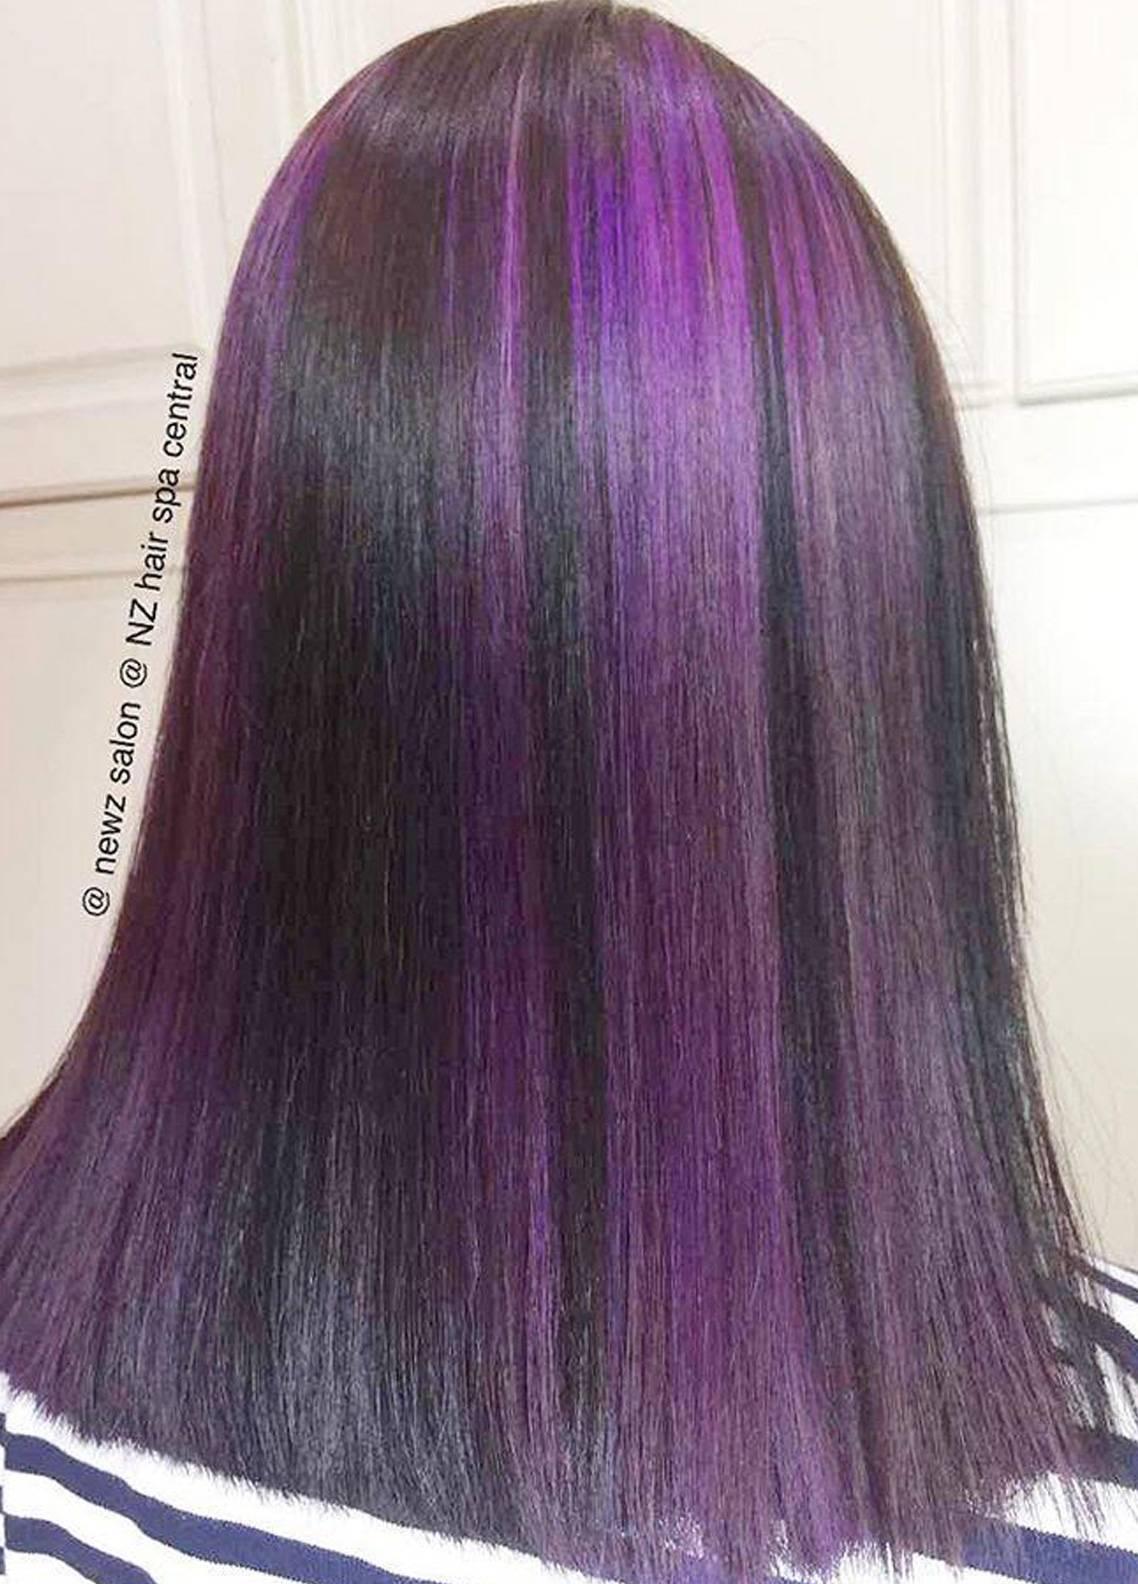 1518e387cb Buy Schwarzkopf Igora ColorWorx Direct Dye Hair Color - Purple ...